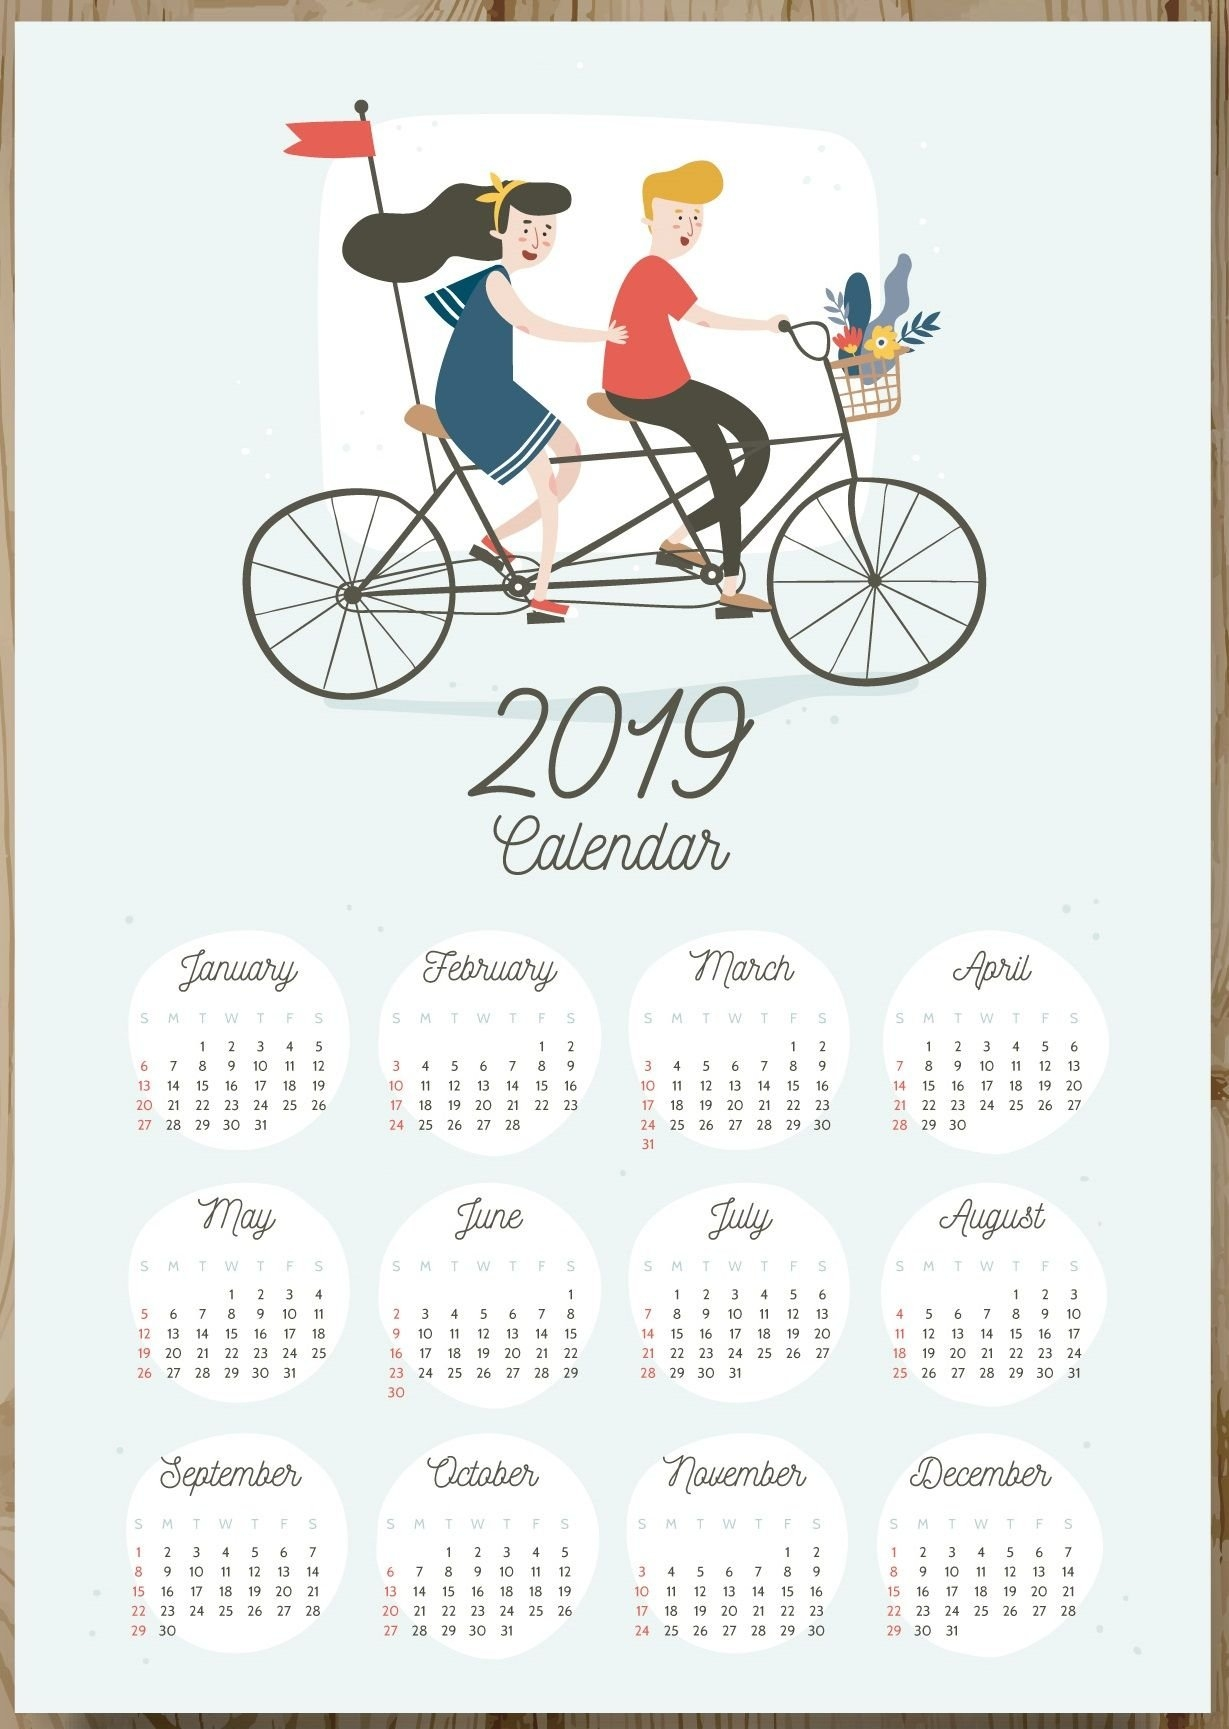 12 Months 2019 One Page Calendar   –Keepsake–   Pinterest Page 3 Calendar 2019